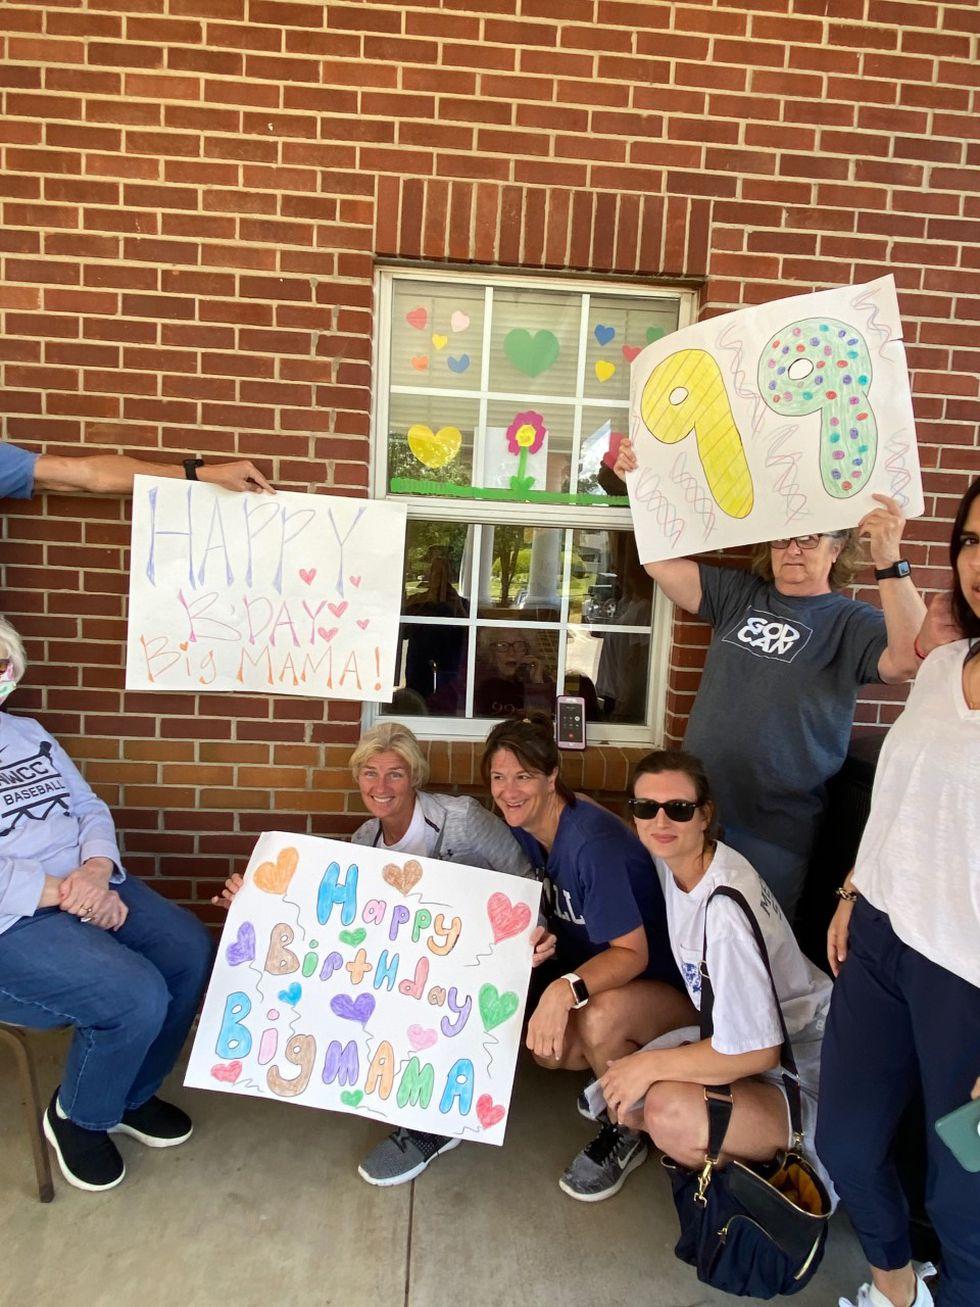 Family celebrates grandmother's 99th birthday through facility window